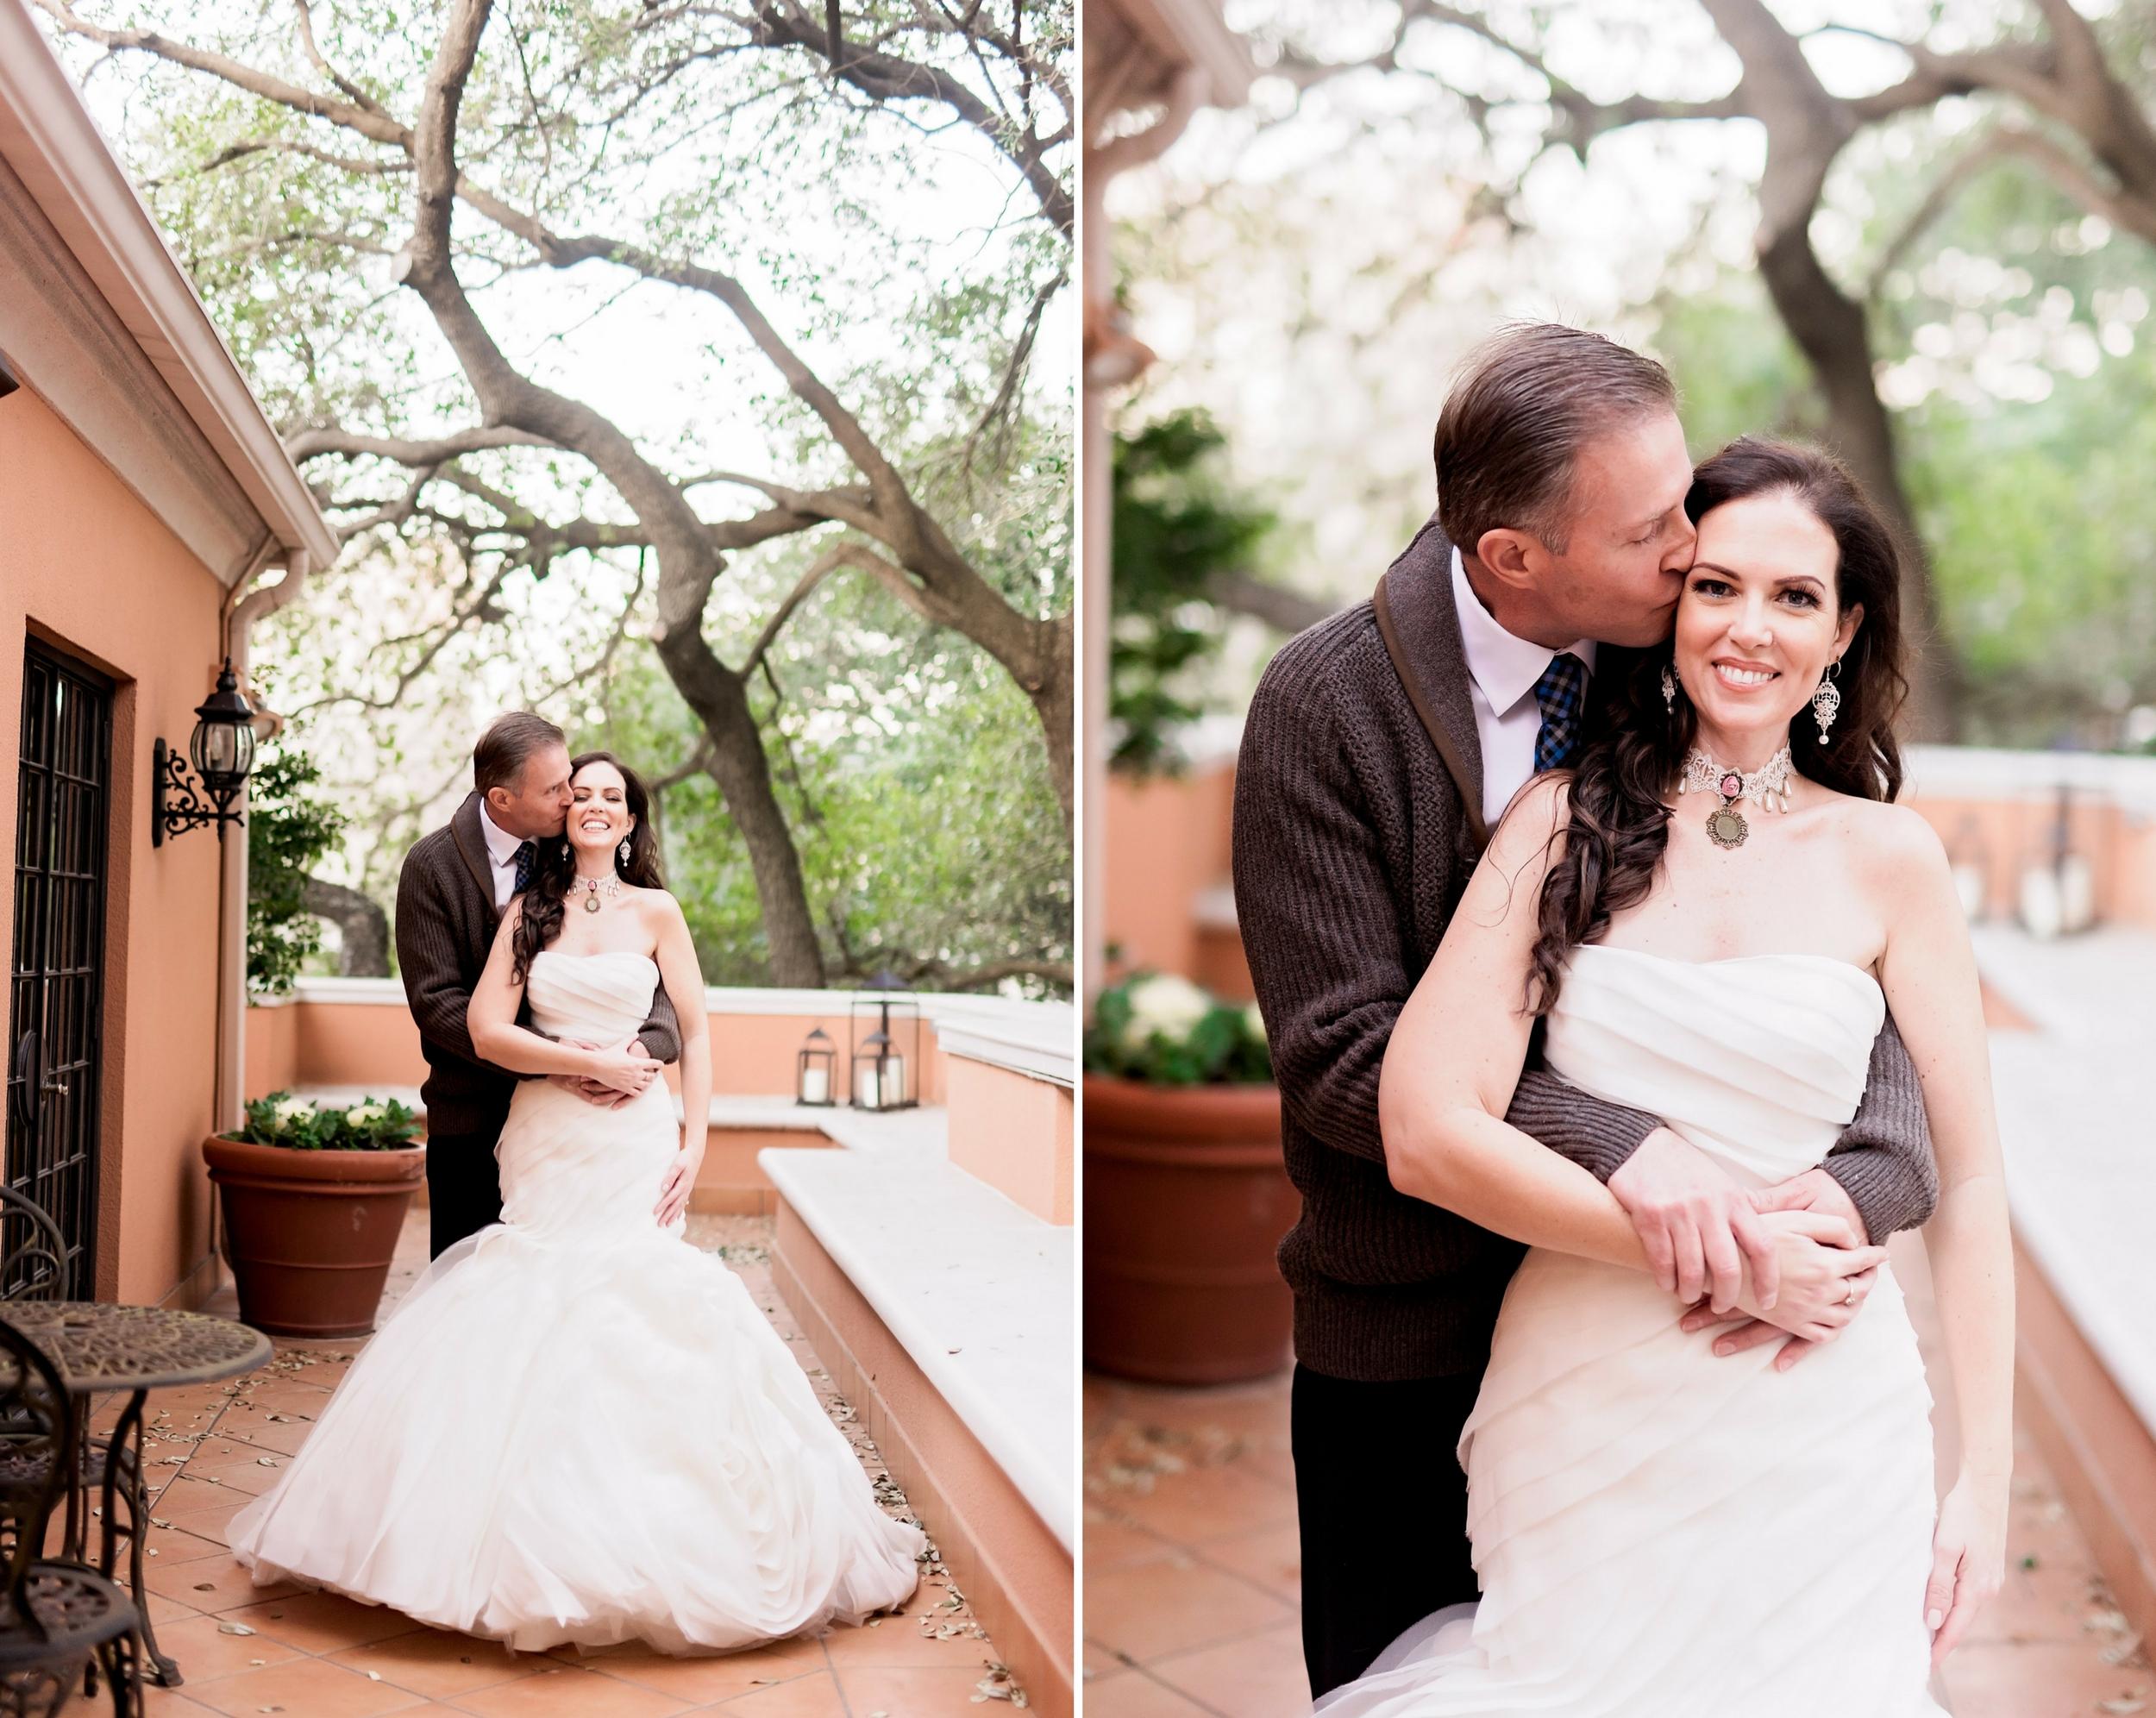 Heather-Jack-Wedding-Pharris-Photography-14.jpg